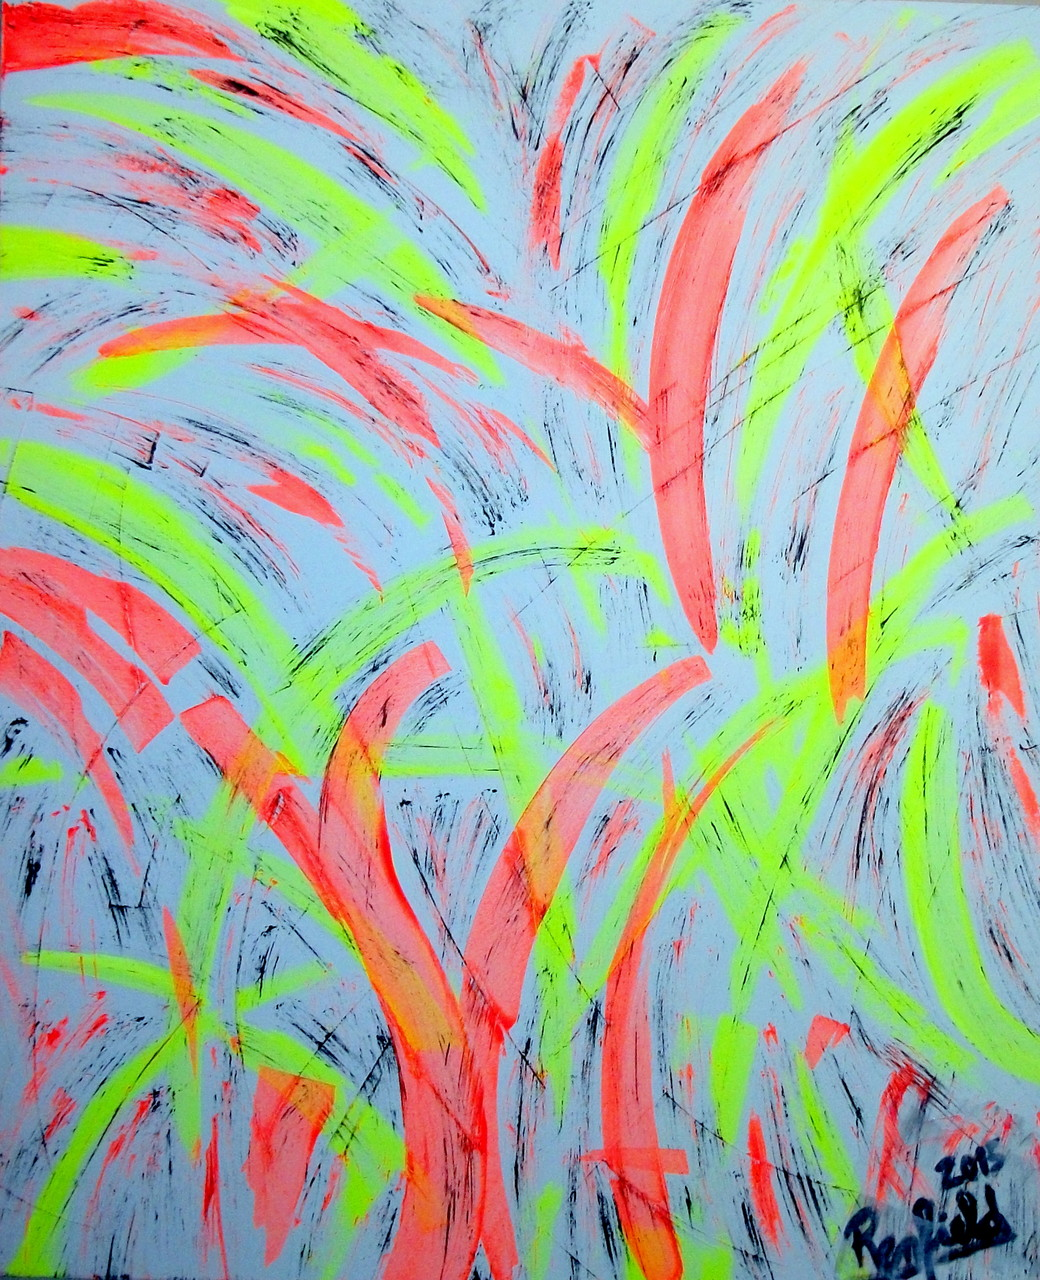 The Light (100 x 120 ) Acryl auf Leinwand mit Leuchtenden Farben Kaufpreis 250 €uro